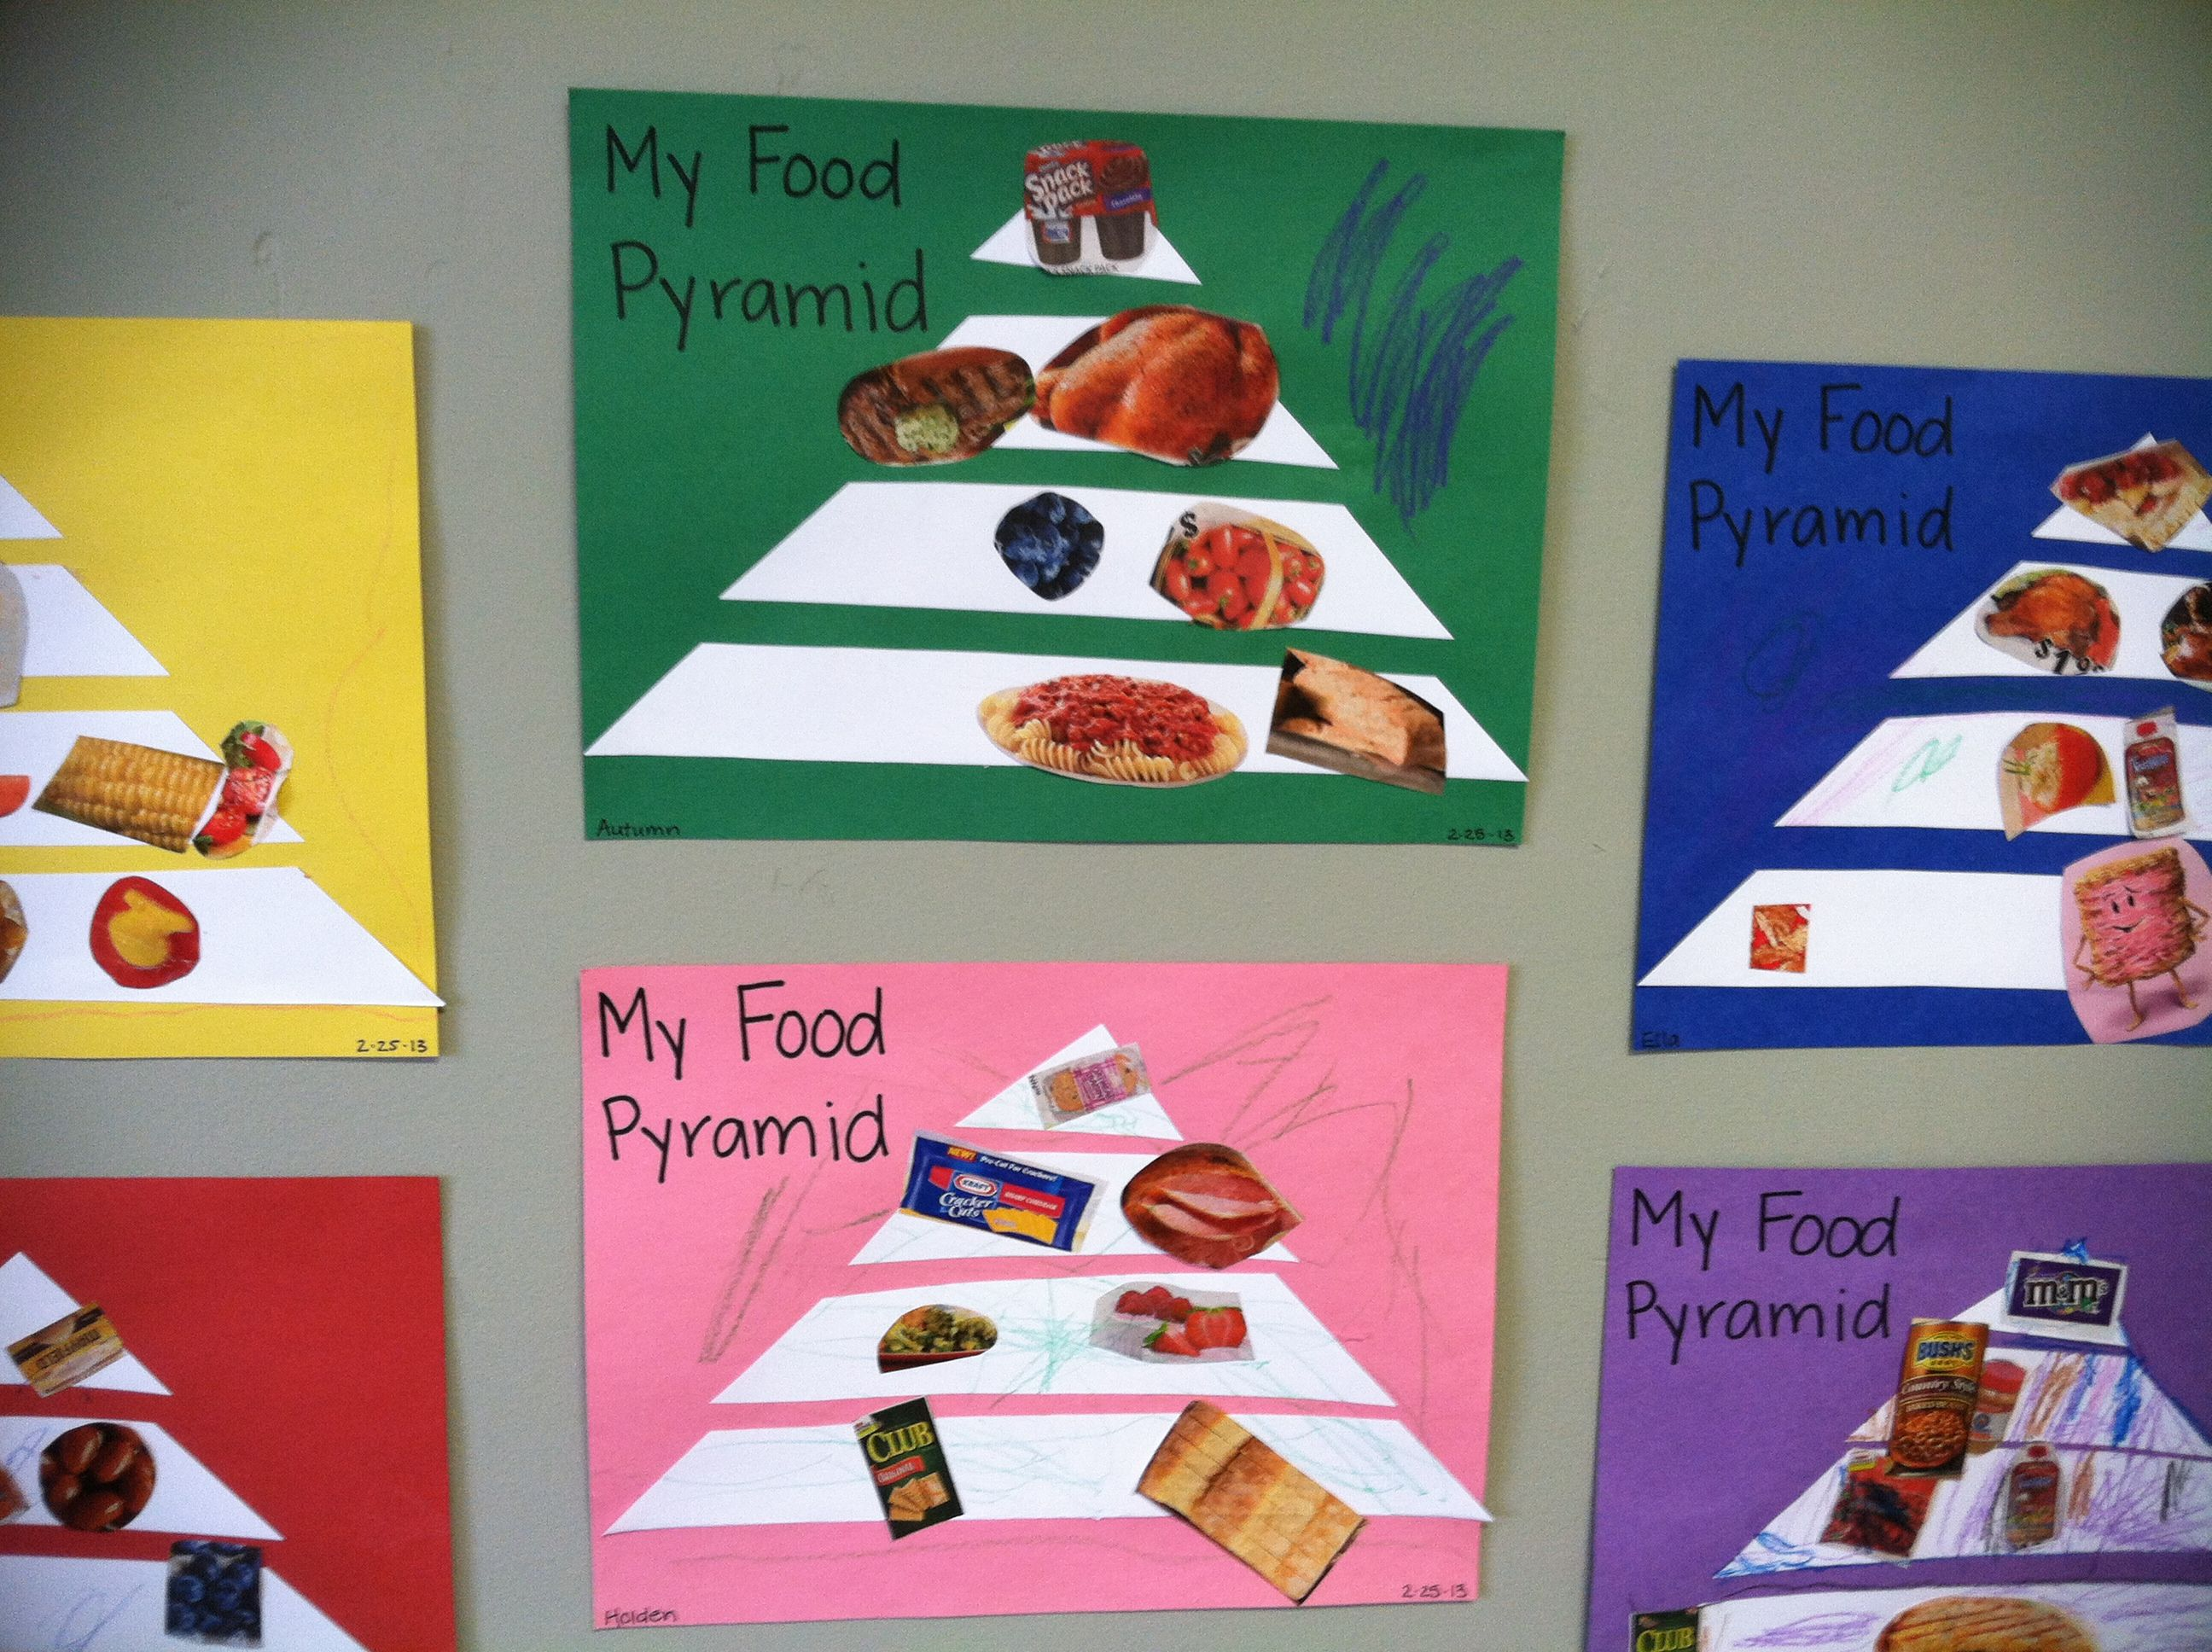 Food pyramids for preschoolers | Preschool Fun | Preschool food